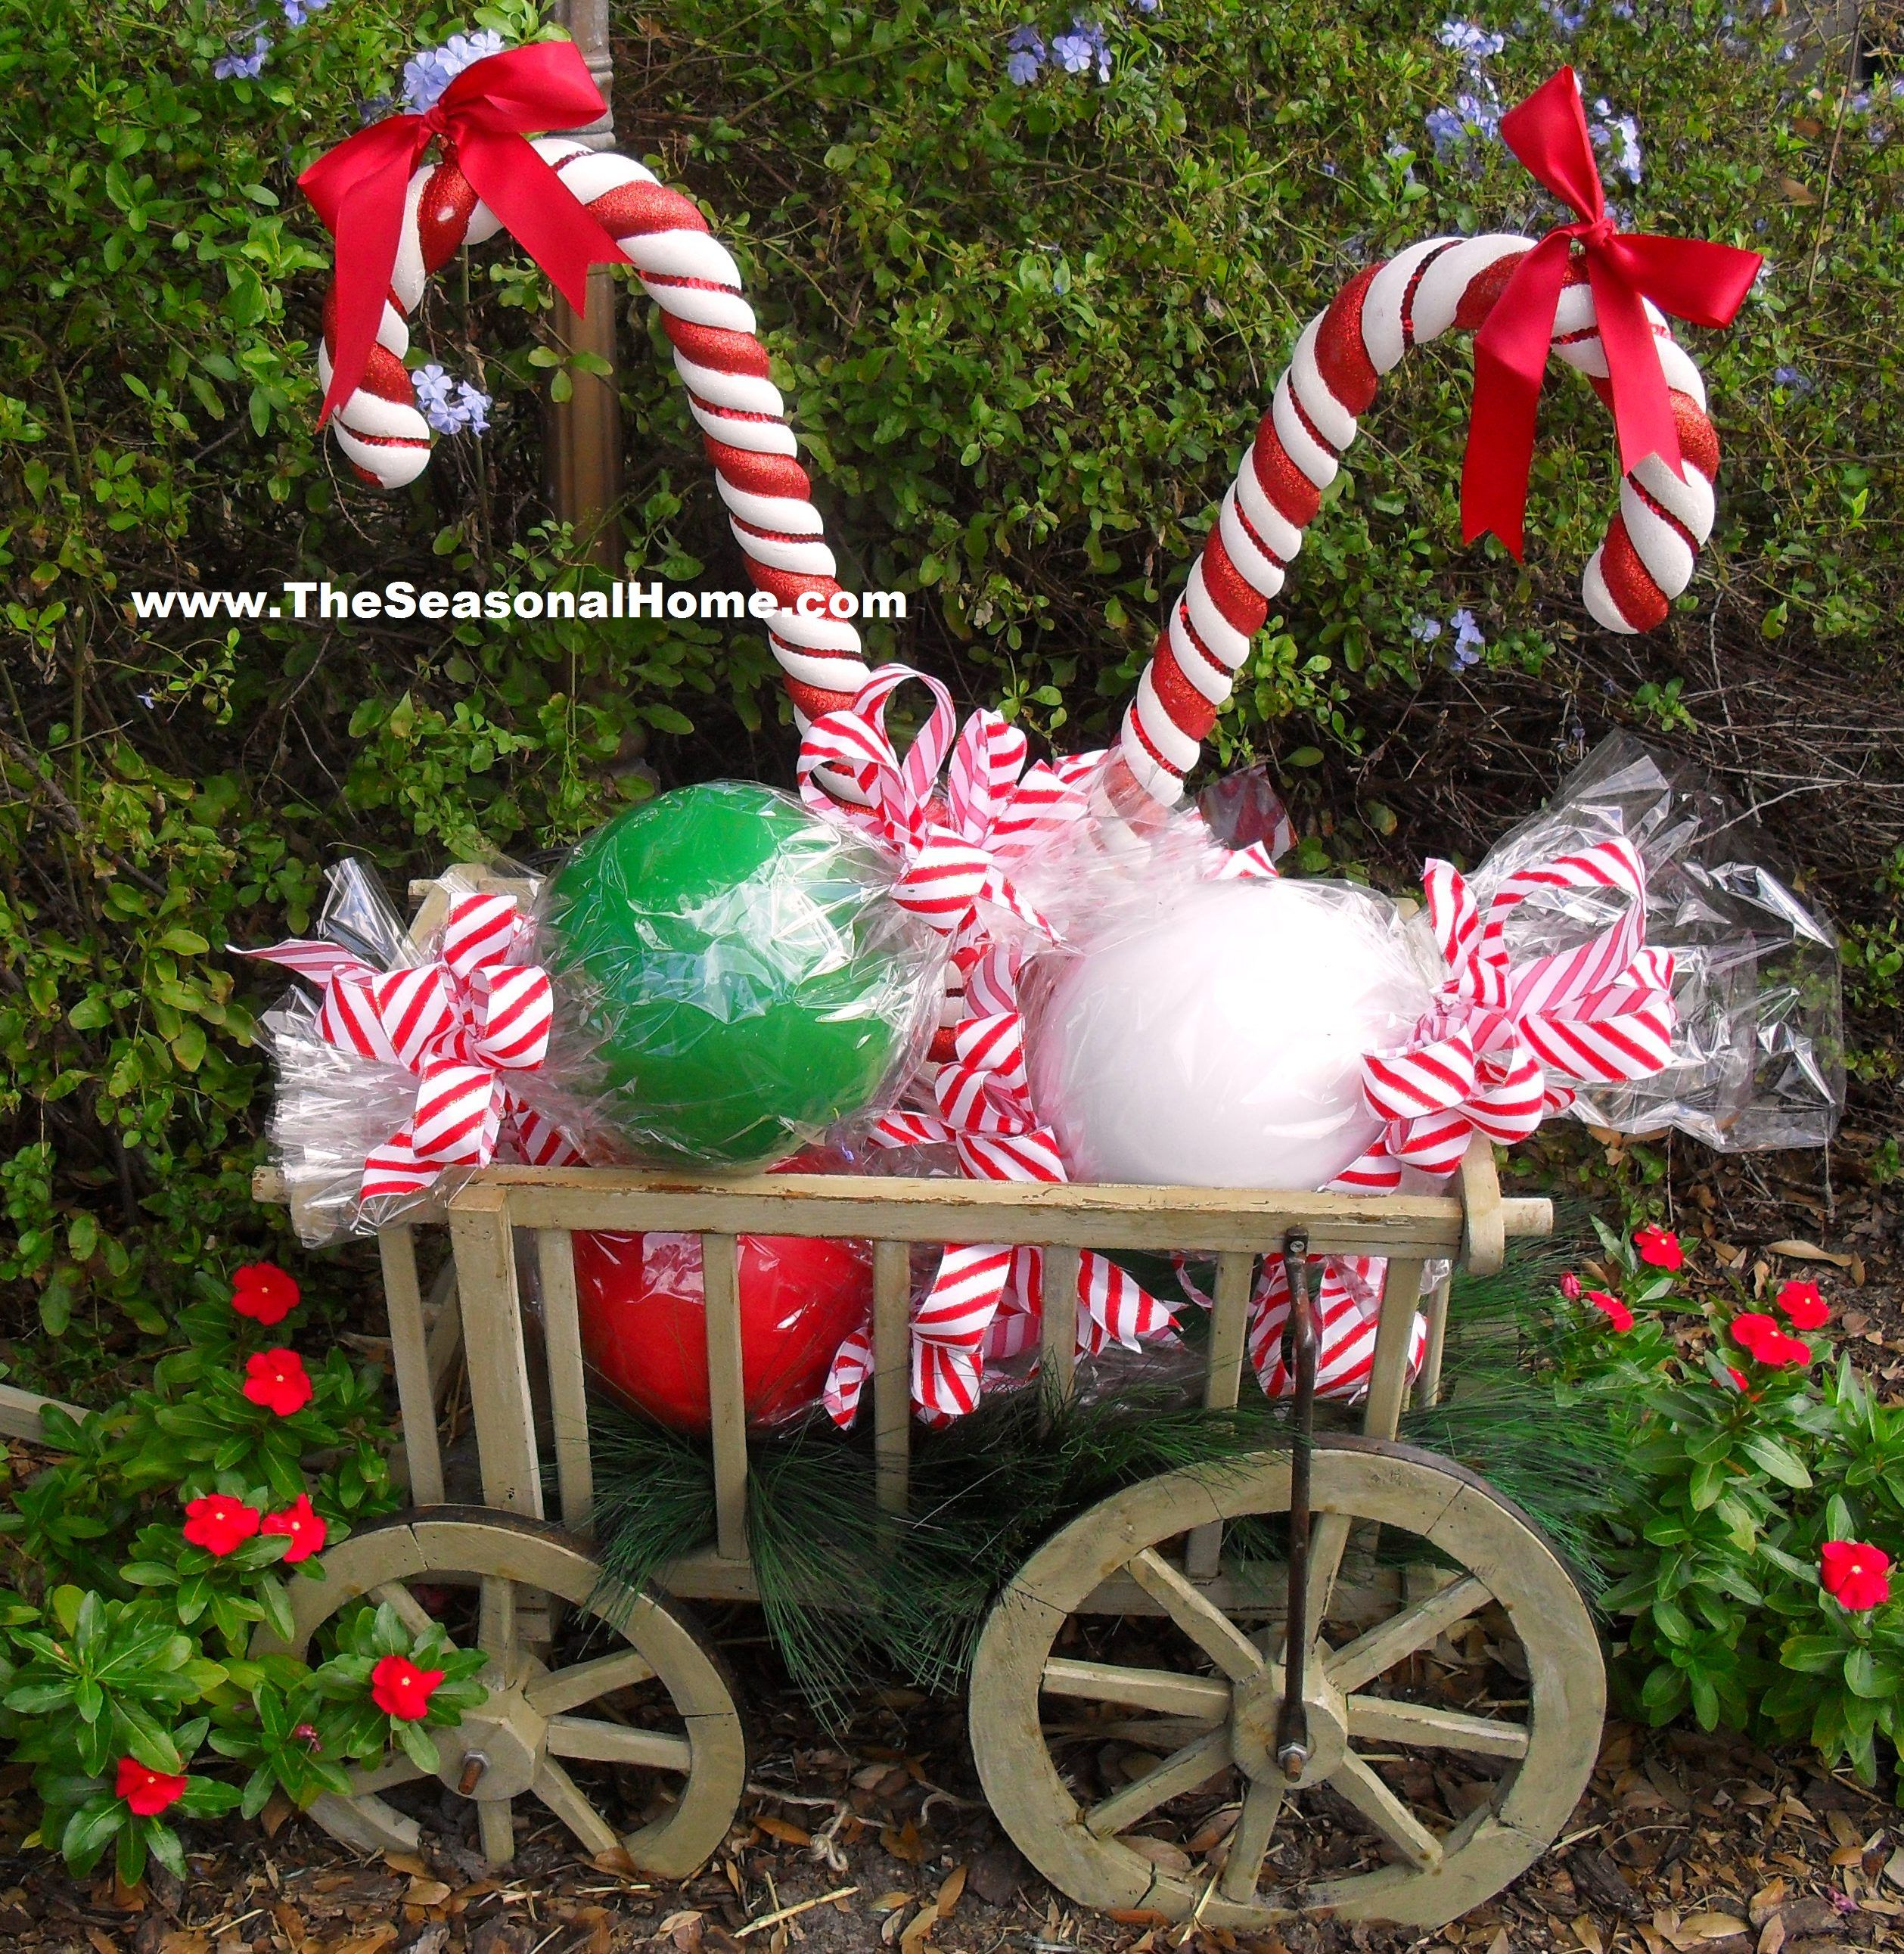 10 Most Inspiring Outdoor Decoration Ideas | Christmas ...